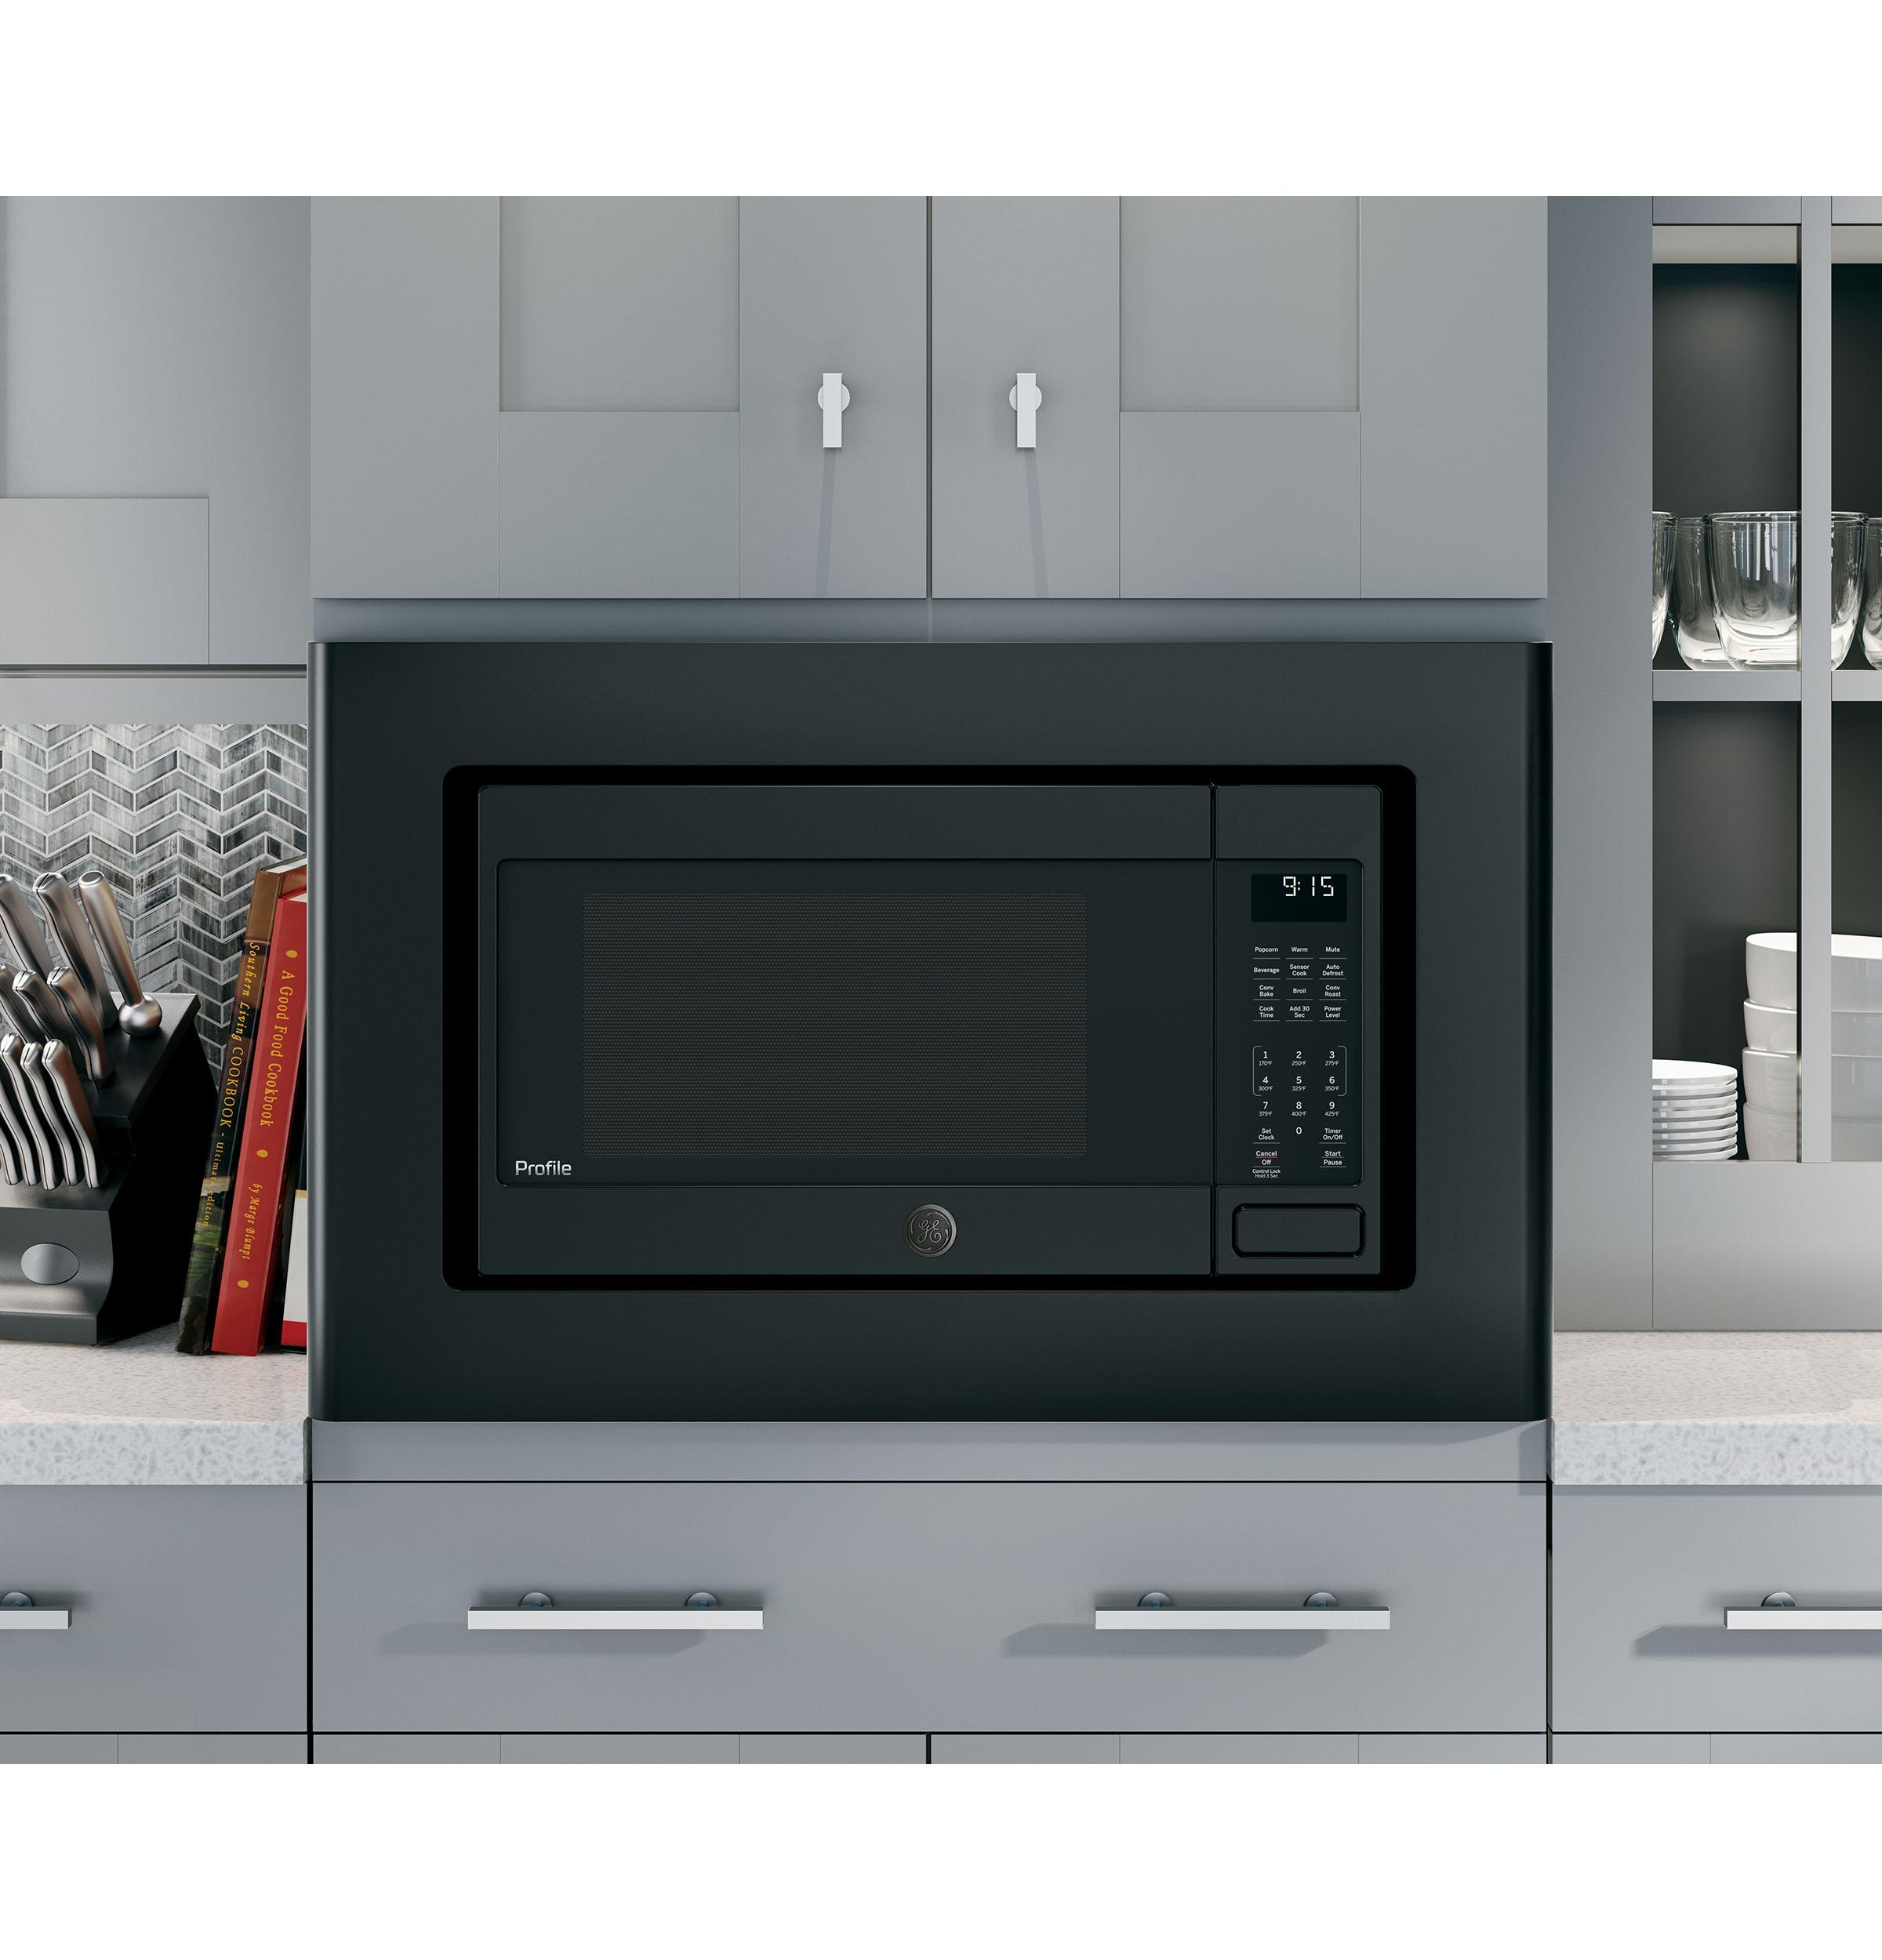 Model: PEB9159DJBB | GE Profile GE Profile™ 1.5 Cu. Ft. Countertop Convection/Microwave Oven